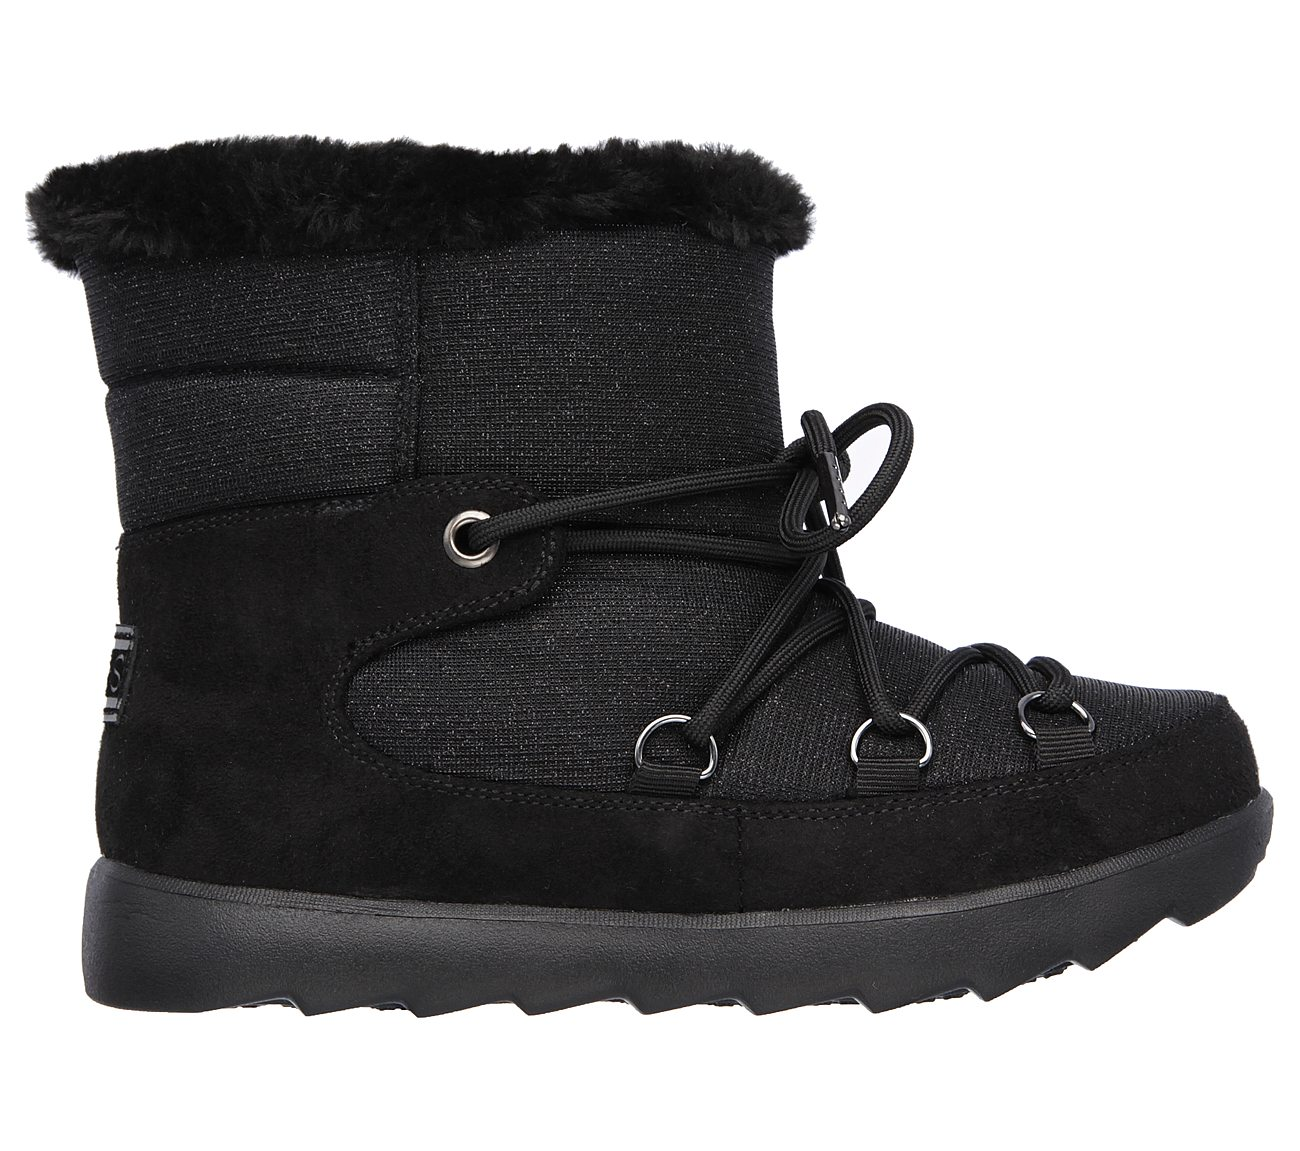 Buy SKECHERS BOBS Mementos - Snowcap BOBS Shoes only  38.00 93ac130eefcd